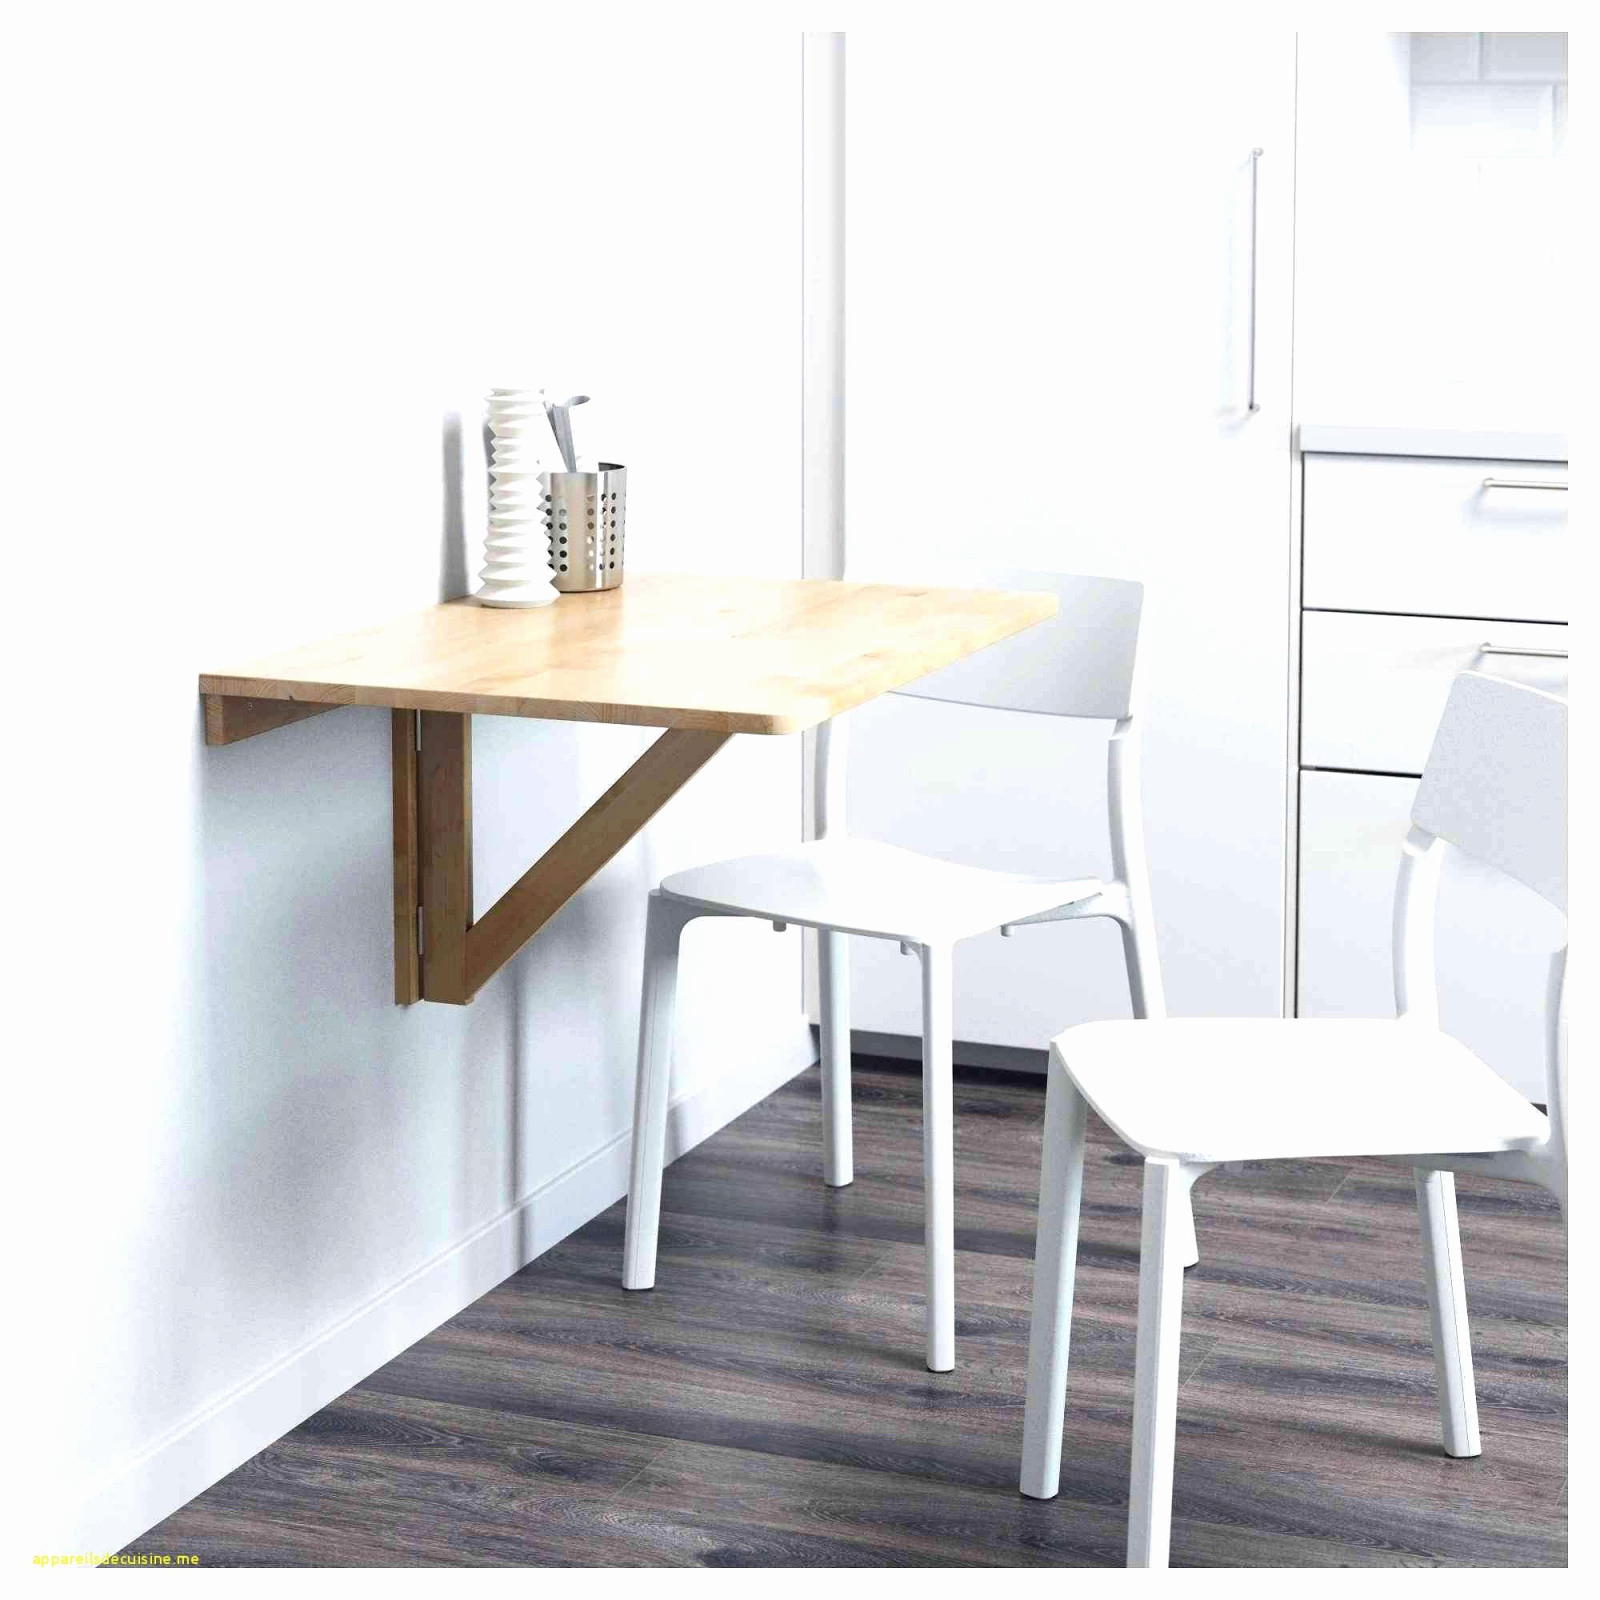 chaise salle a manger scandinave inspire 55 moderne baignoire scandinave of chaise salle a manger scandinave